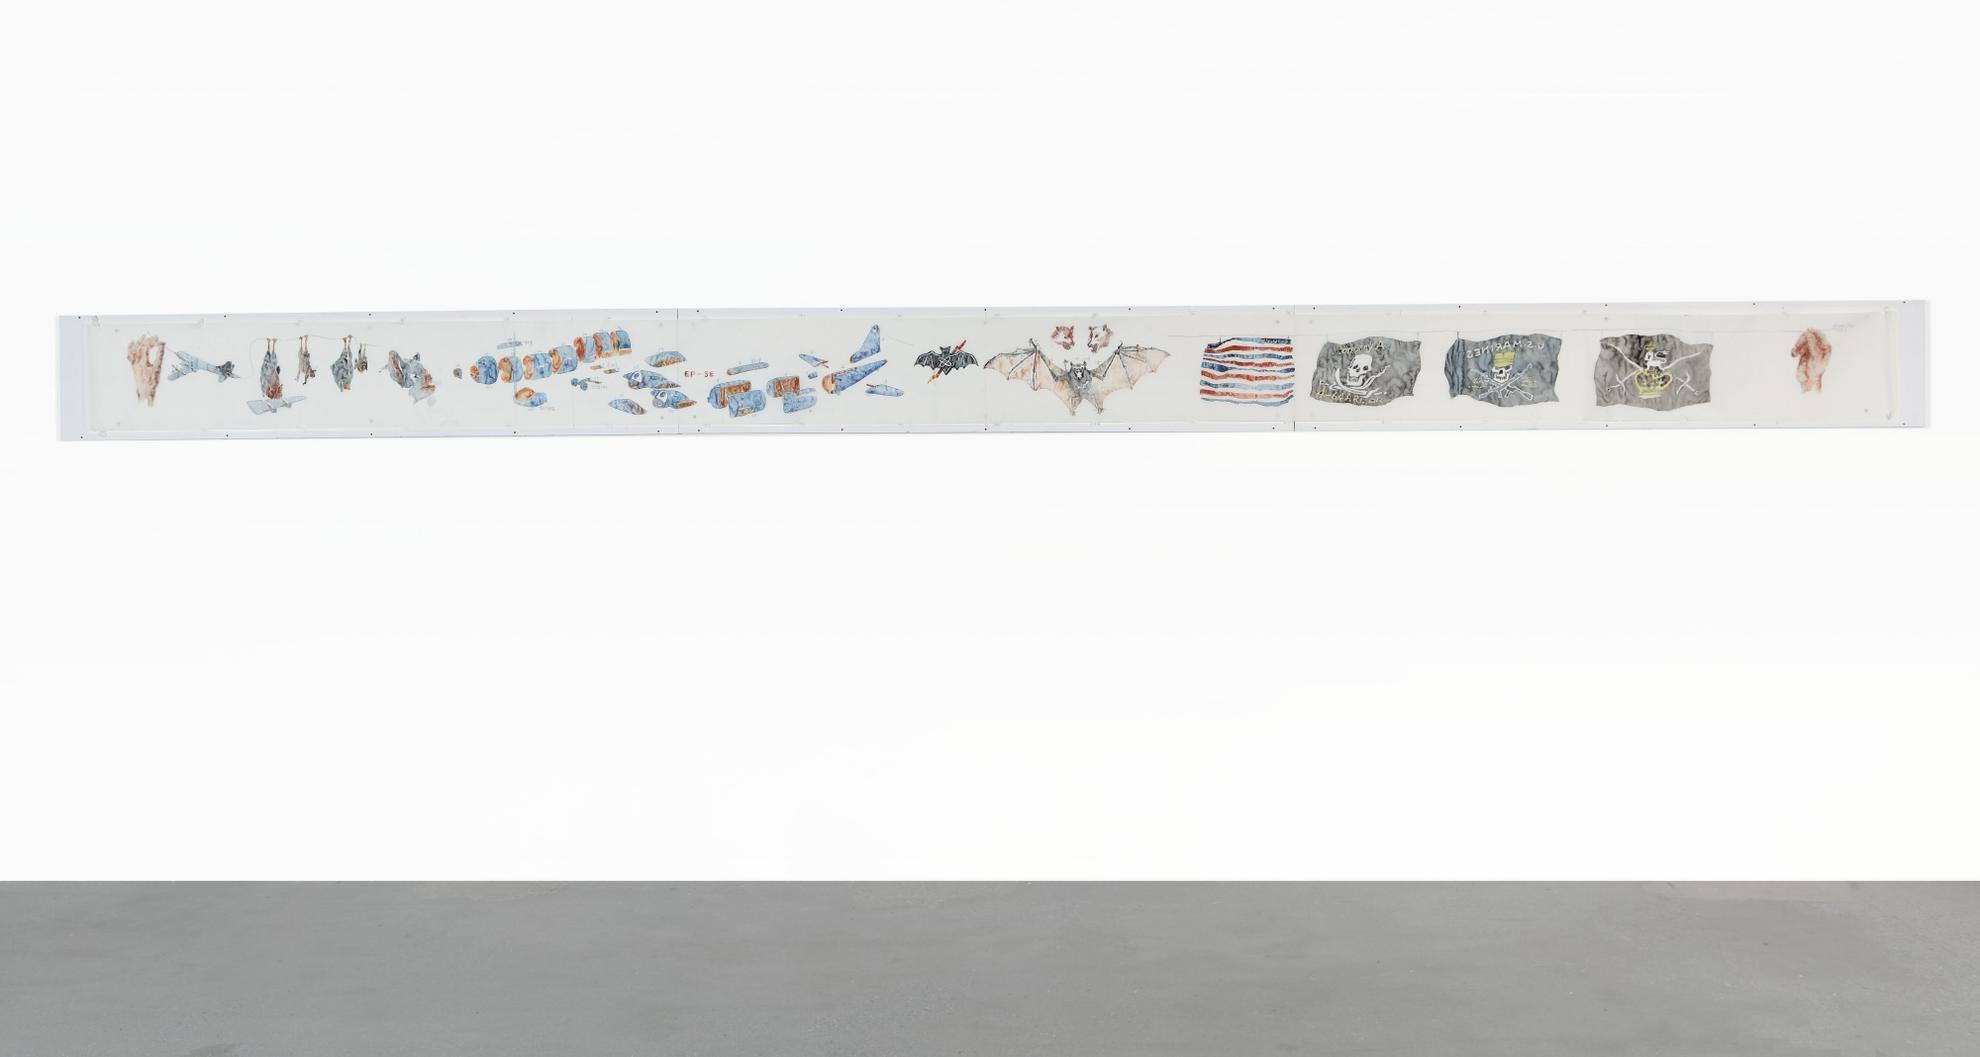 Huang Yong Ping-Long Drawing Of The Bat Project-2003